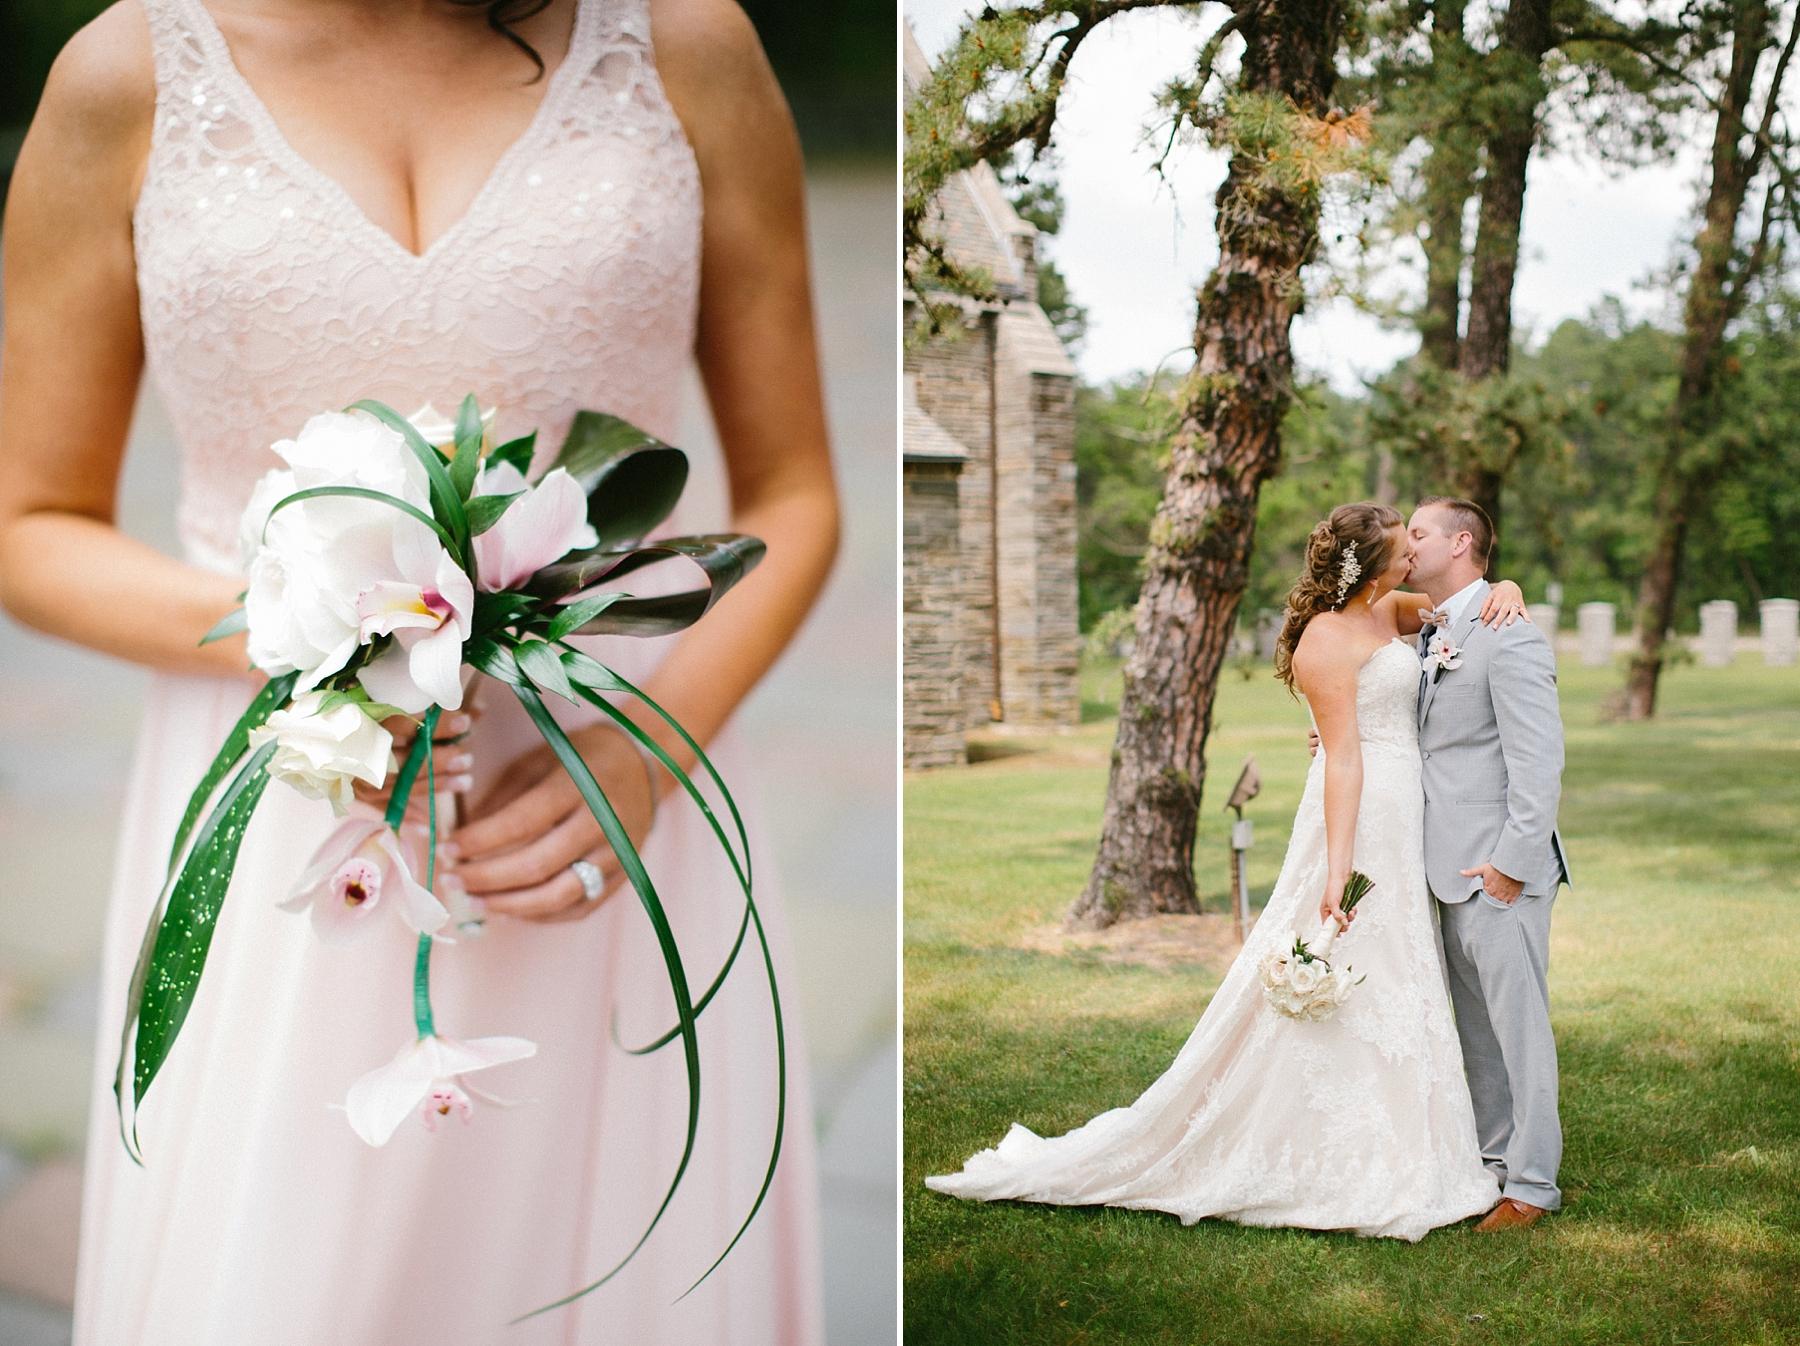 farm-wedding-engagement-session-destination-intimate_0048.jpg